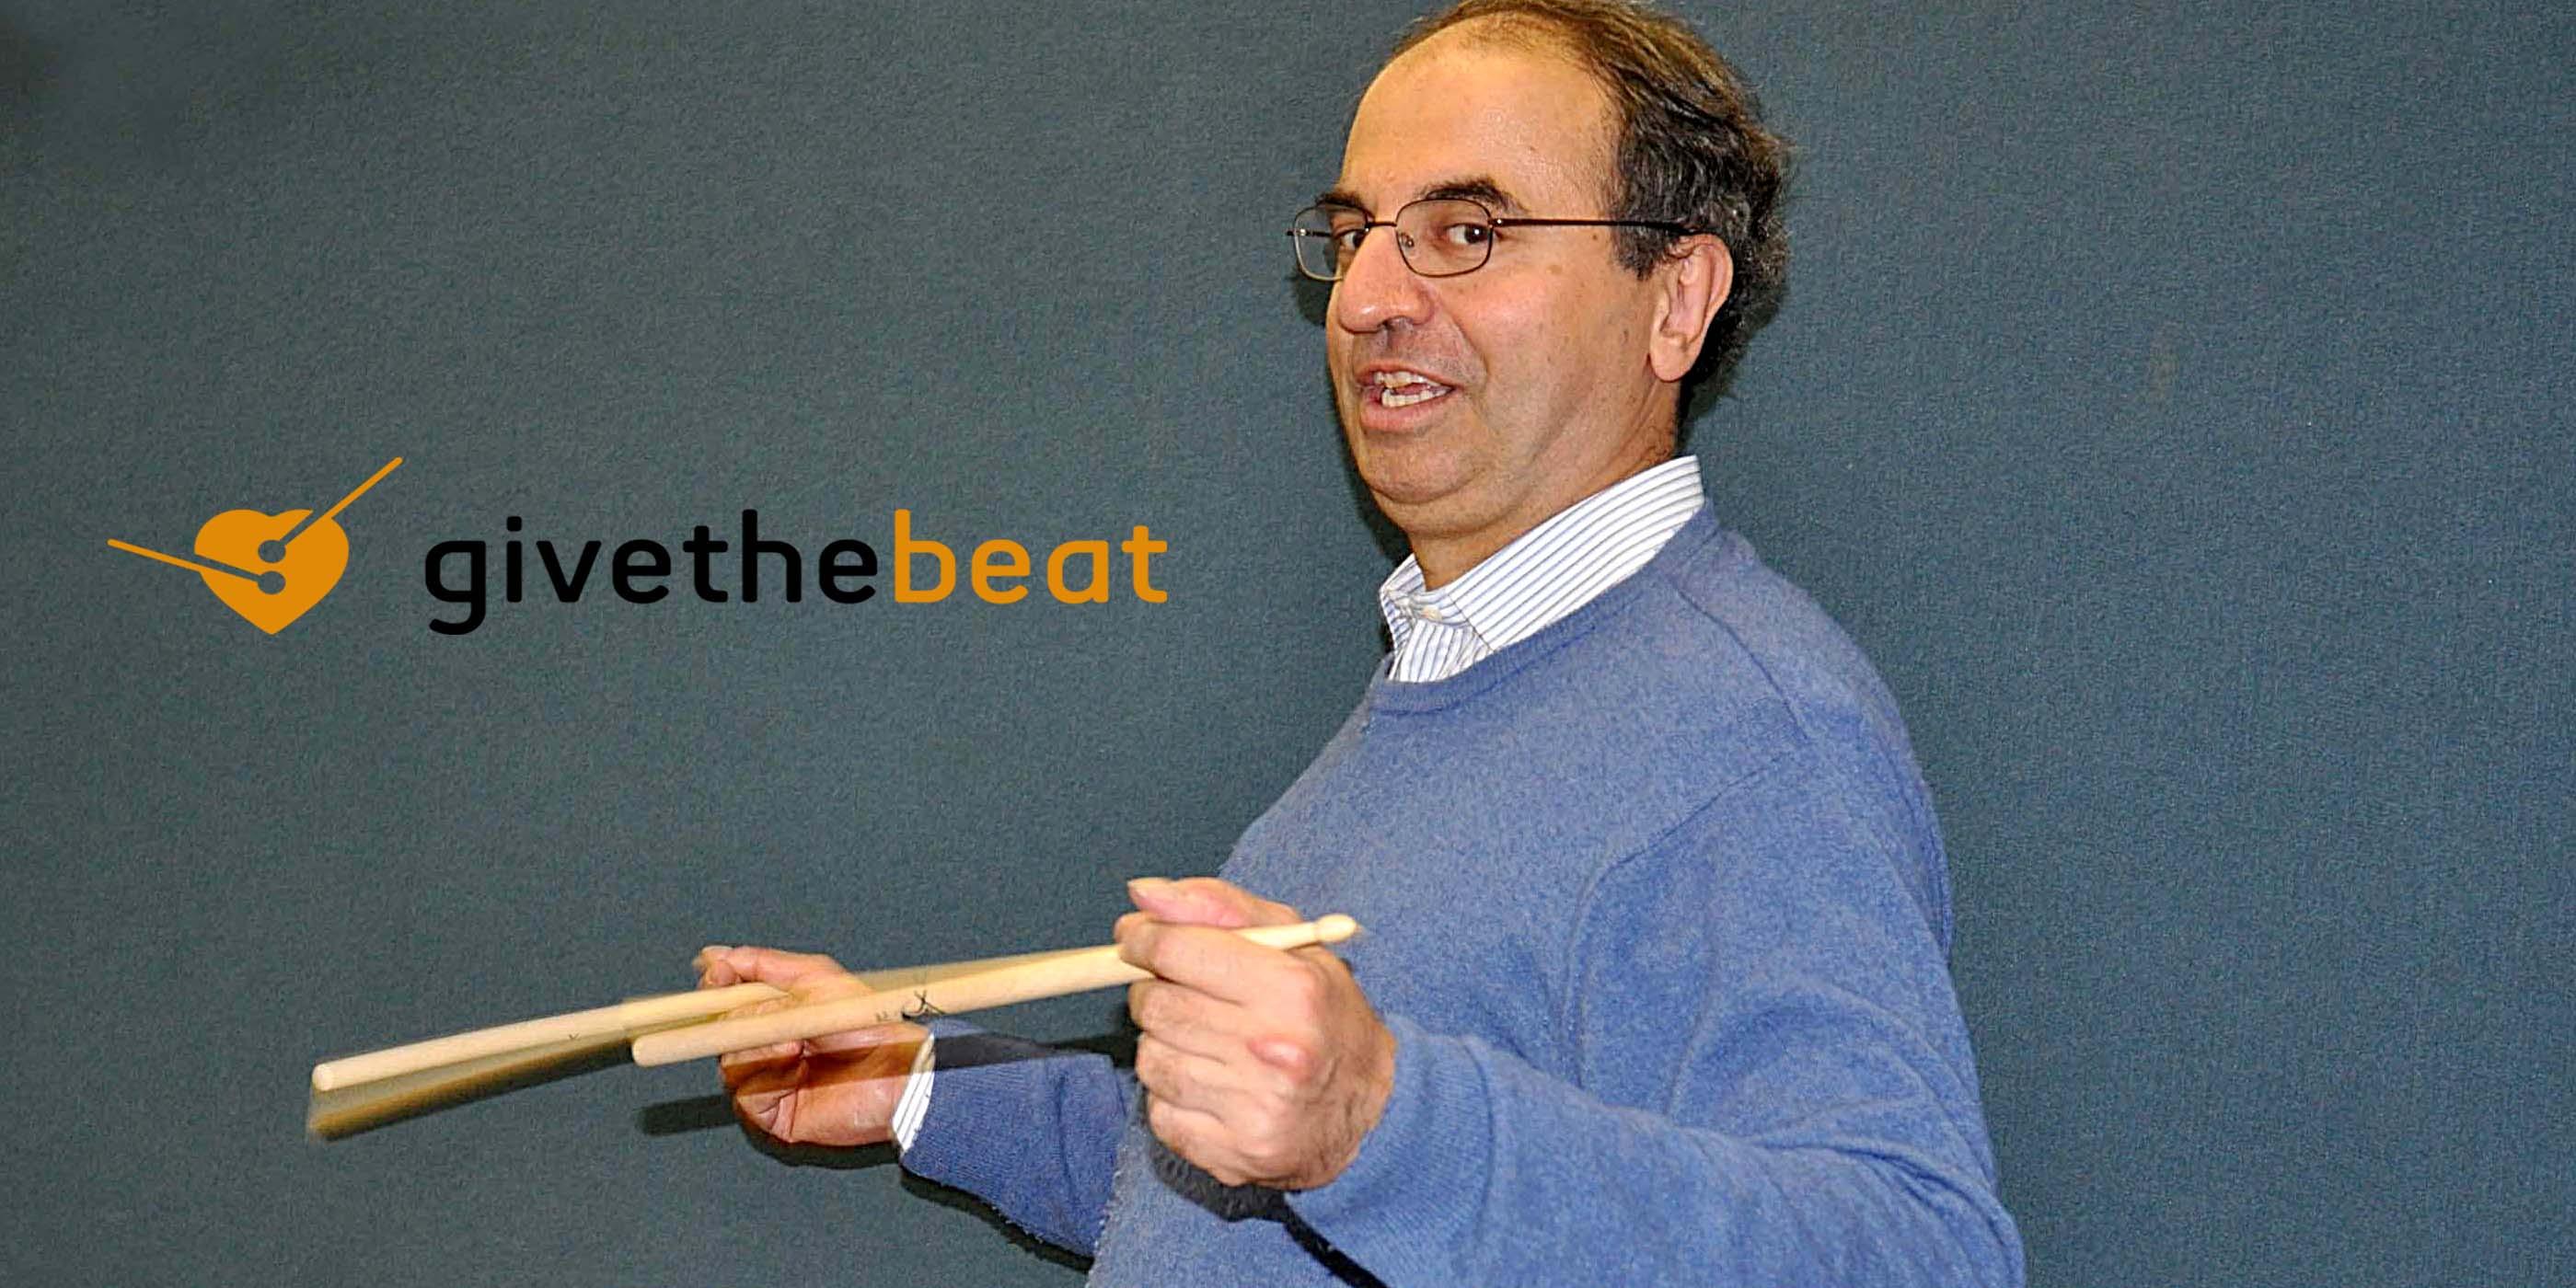 #GivetheBeat! Francesco Fratini-Francesco Fratini